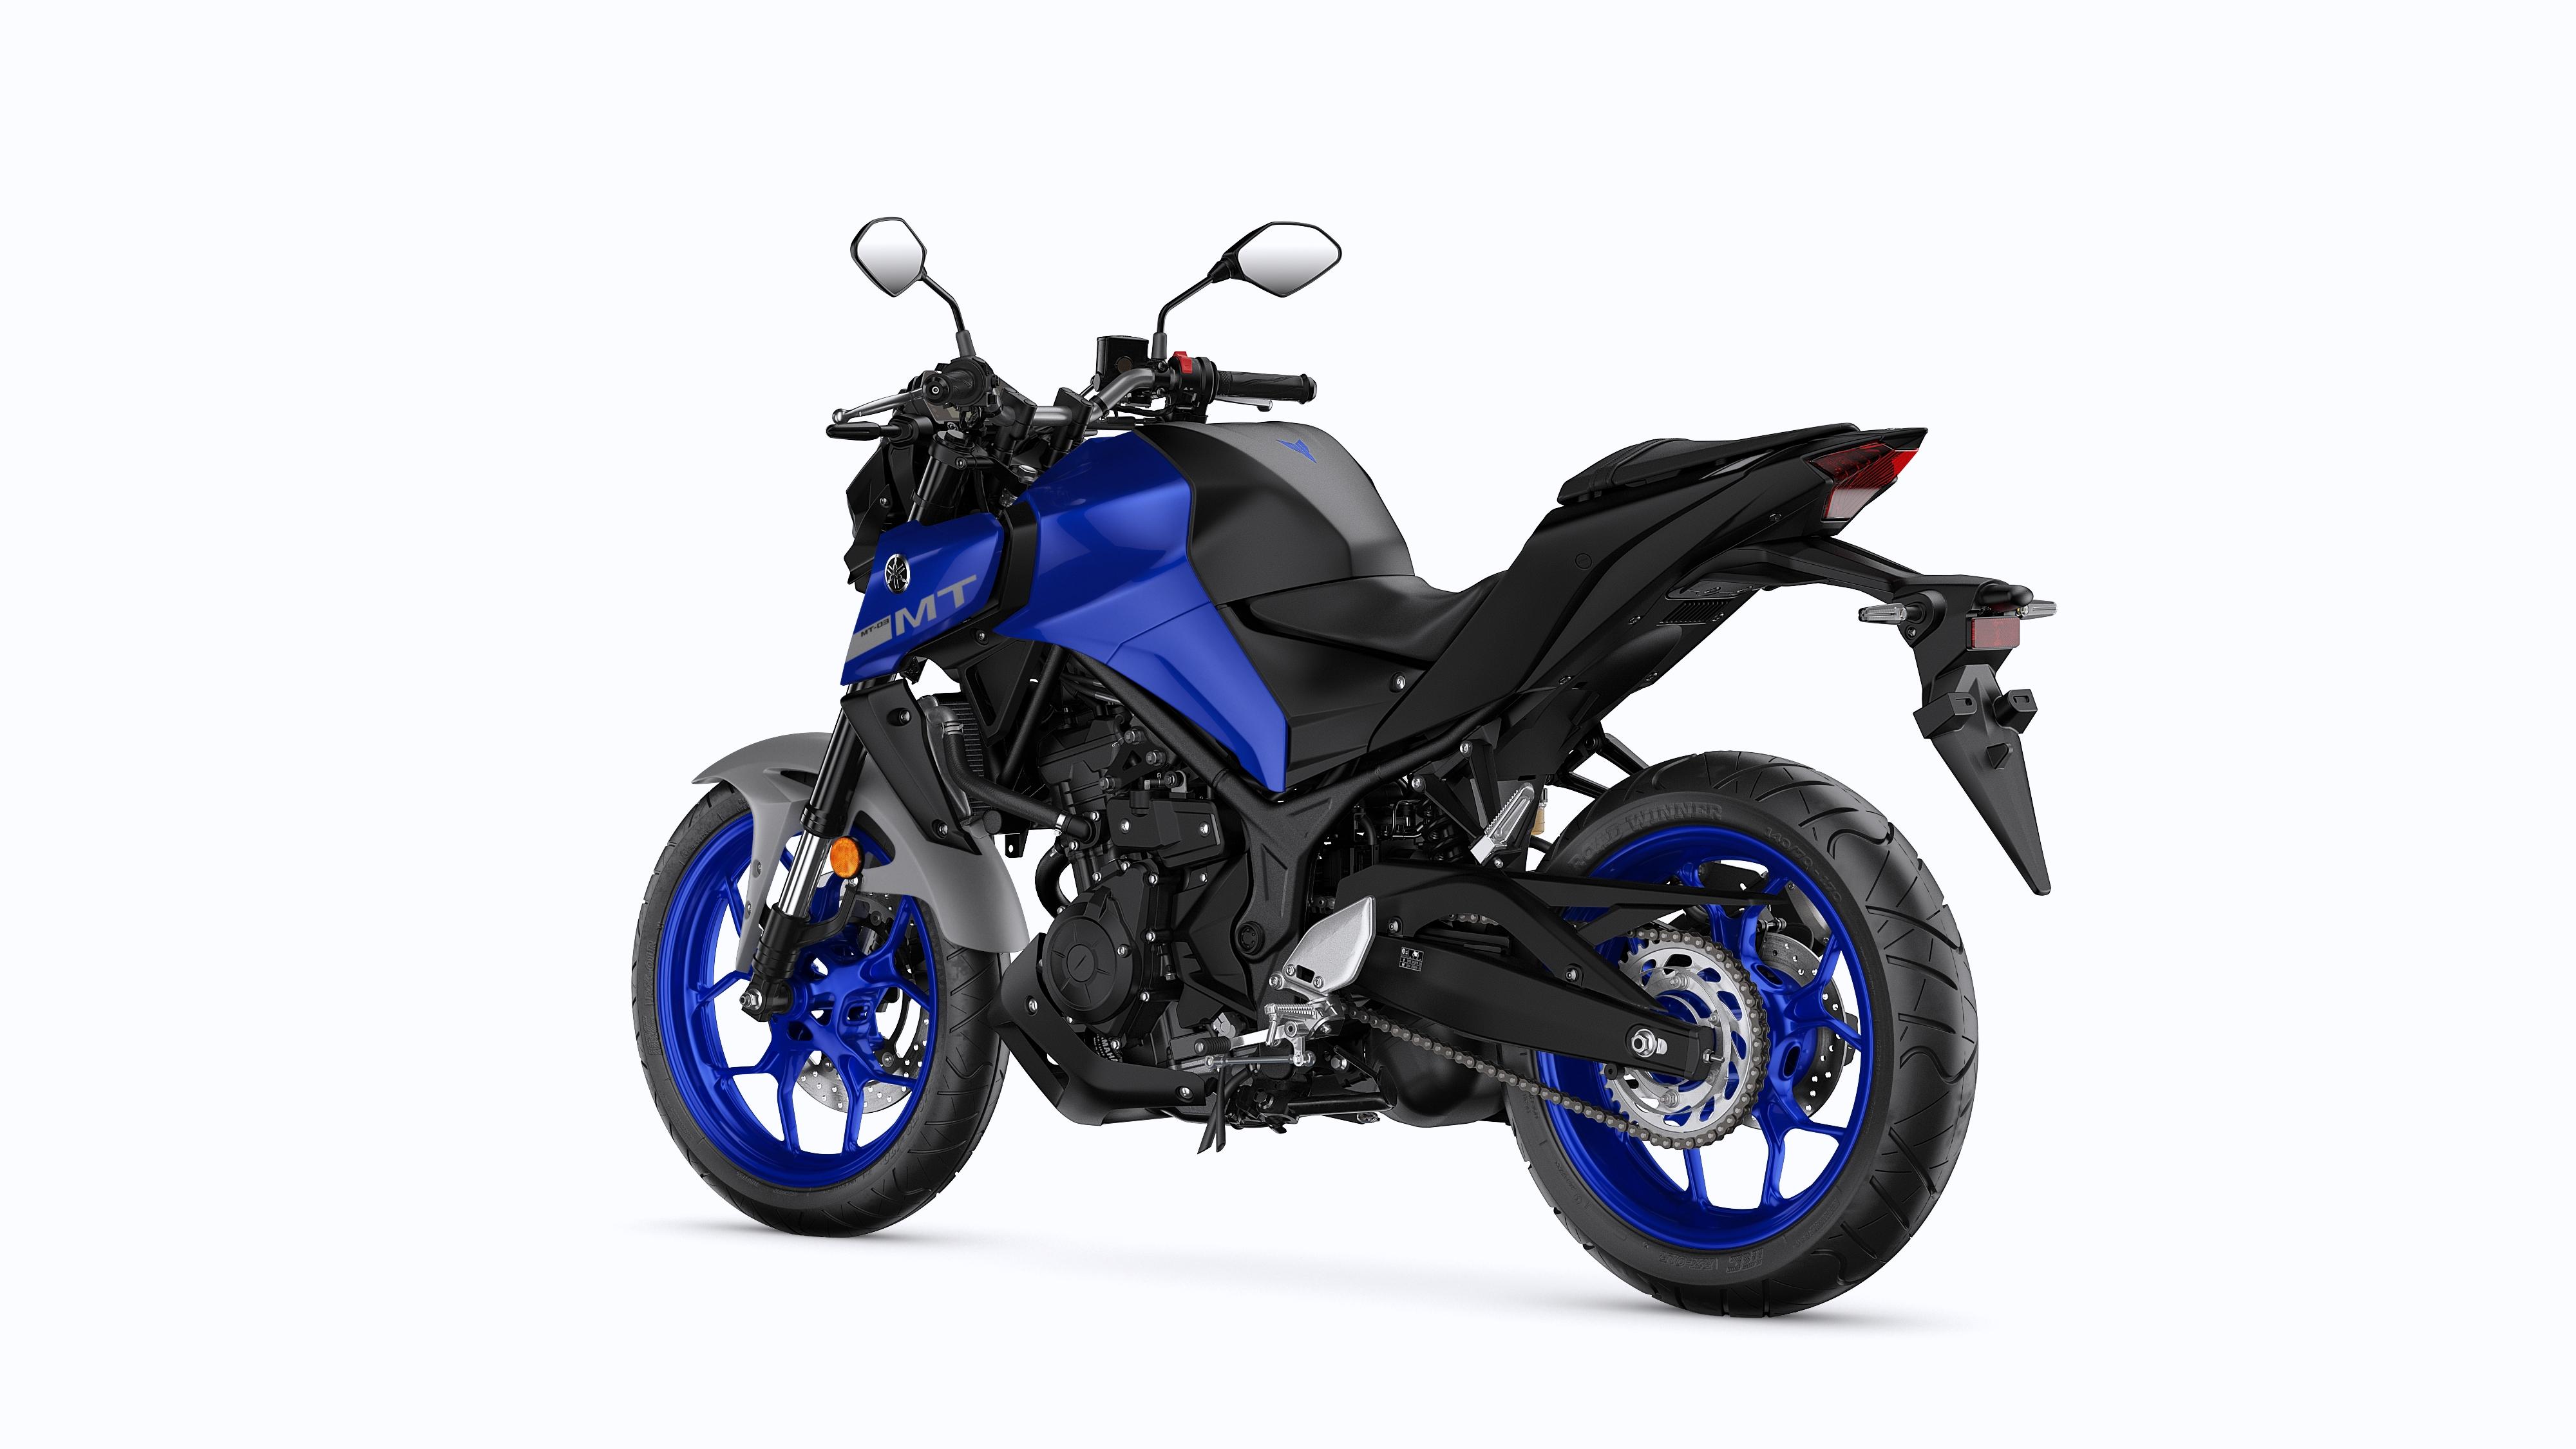 Yamaha MT-03 nu bestellen